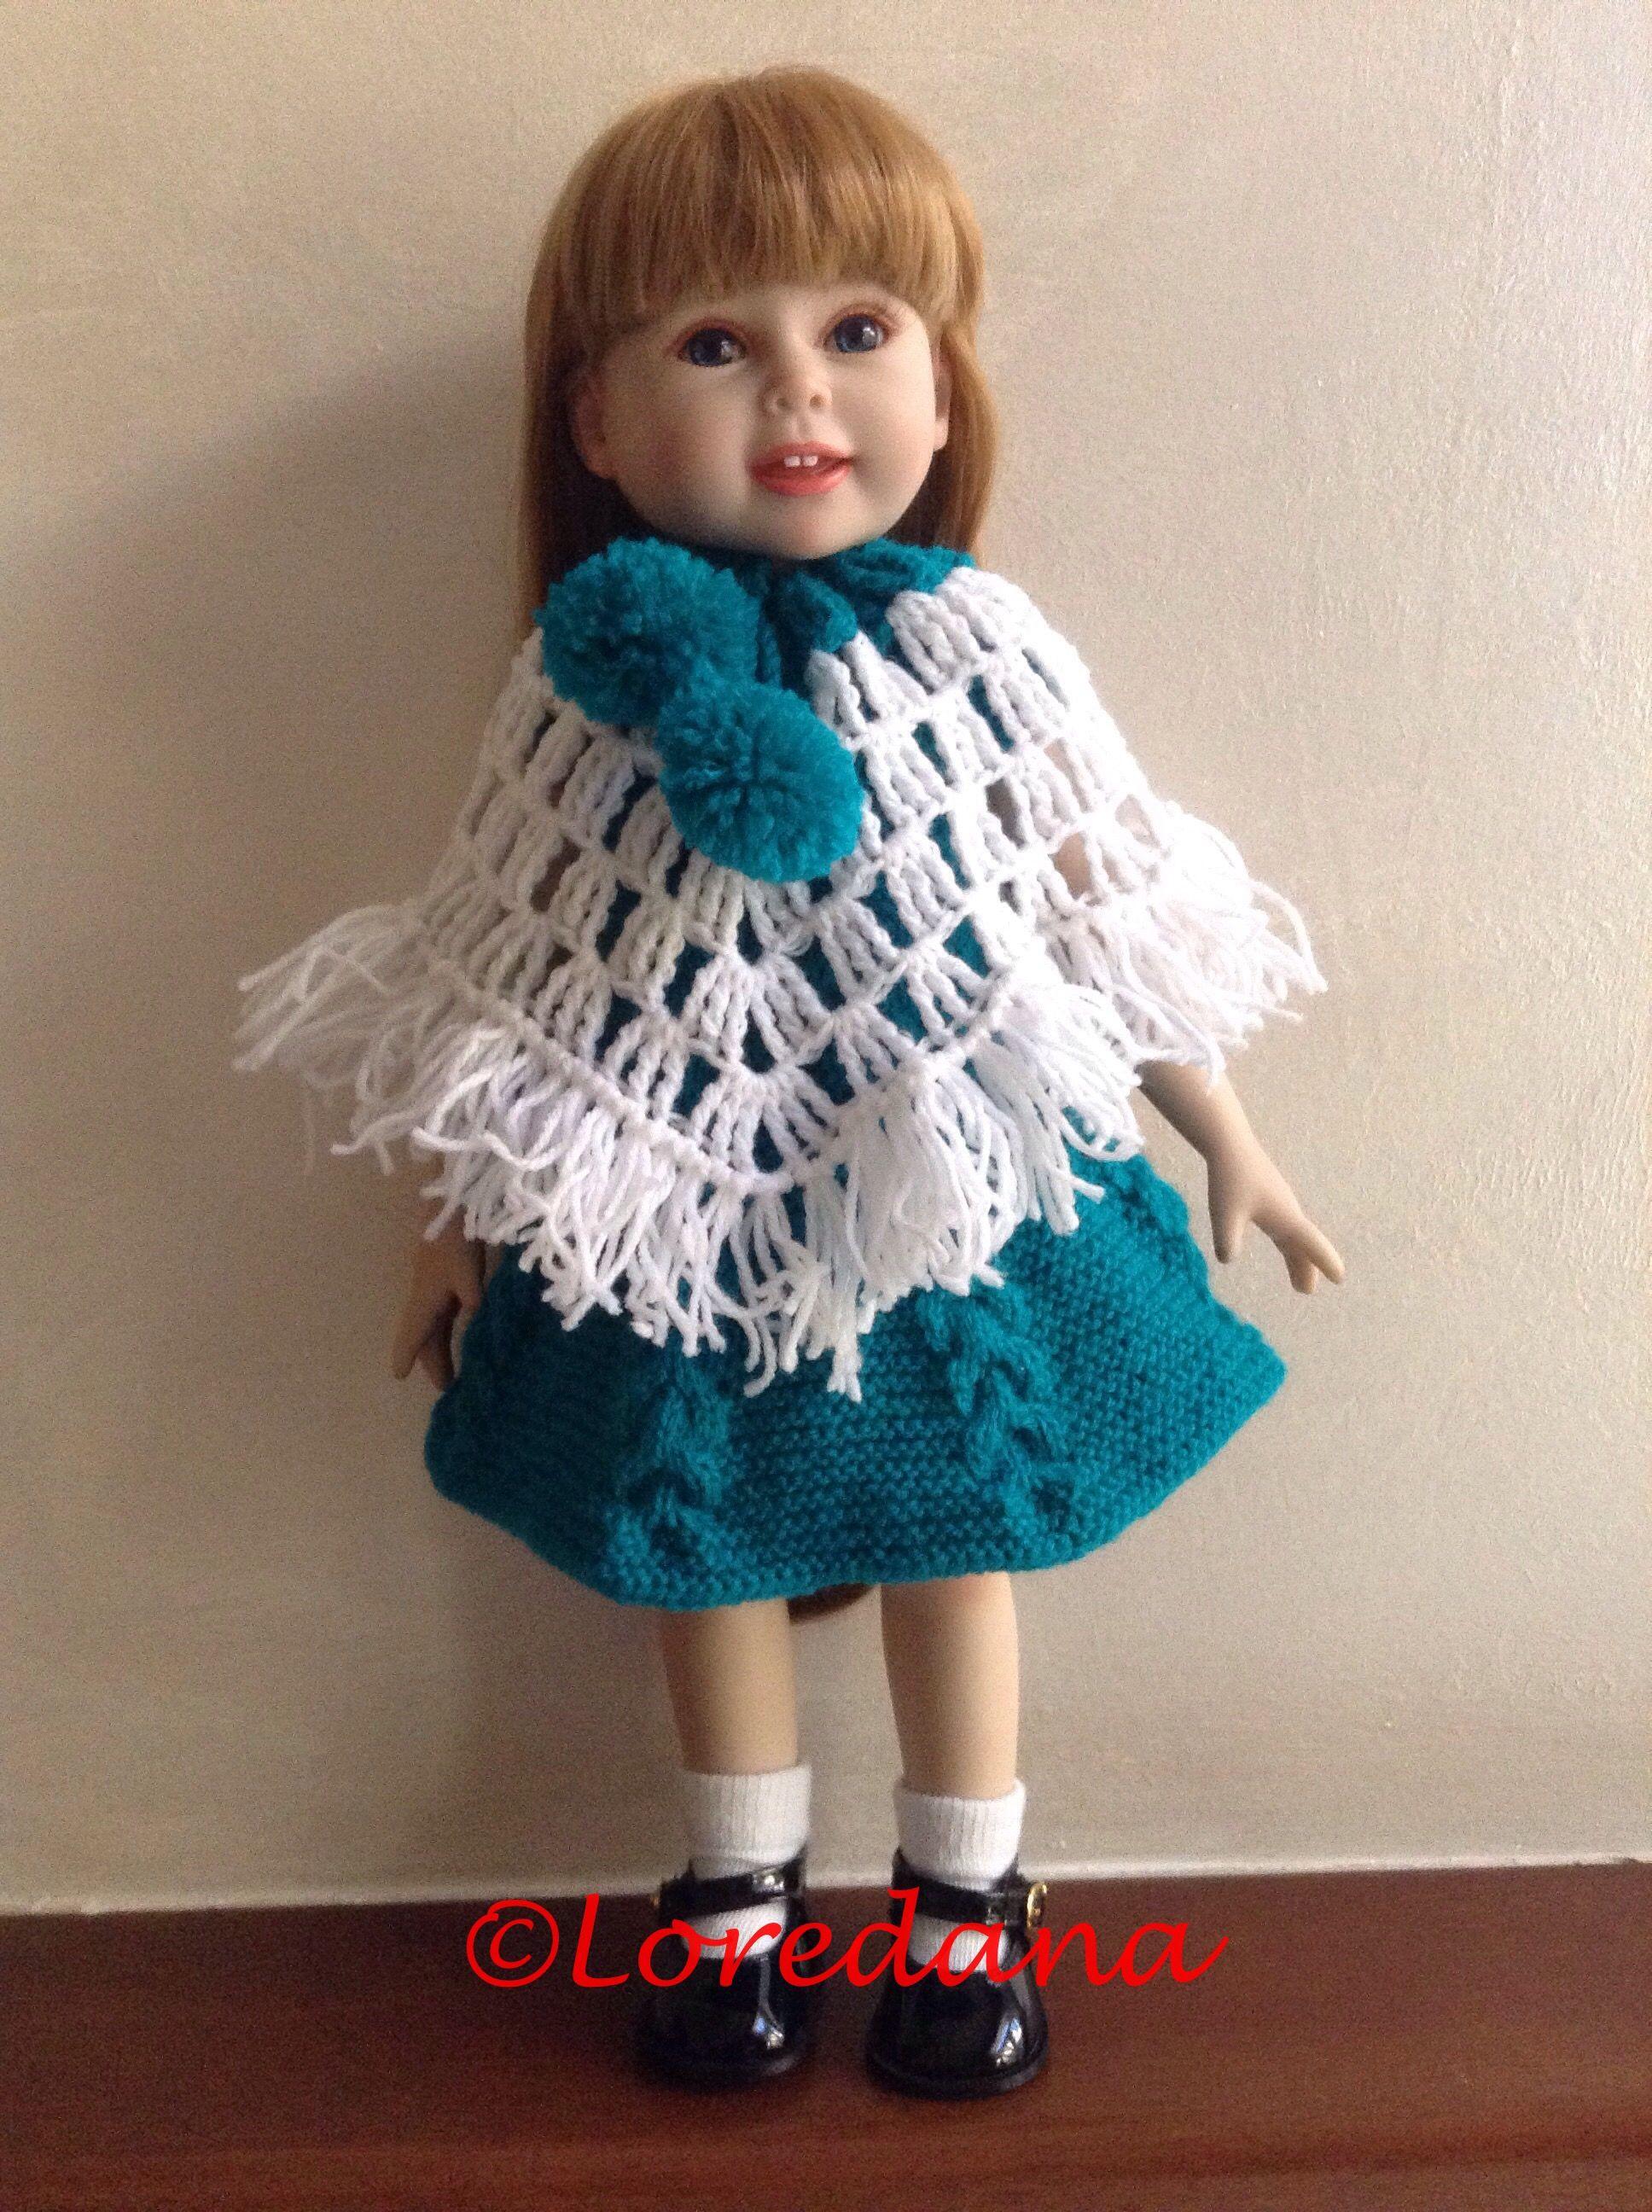 Pin by Loredana Galea on Dolls Flower girl dresses